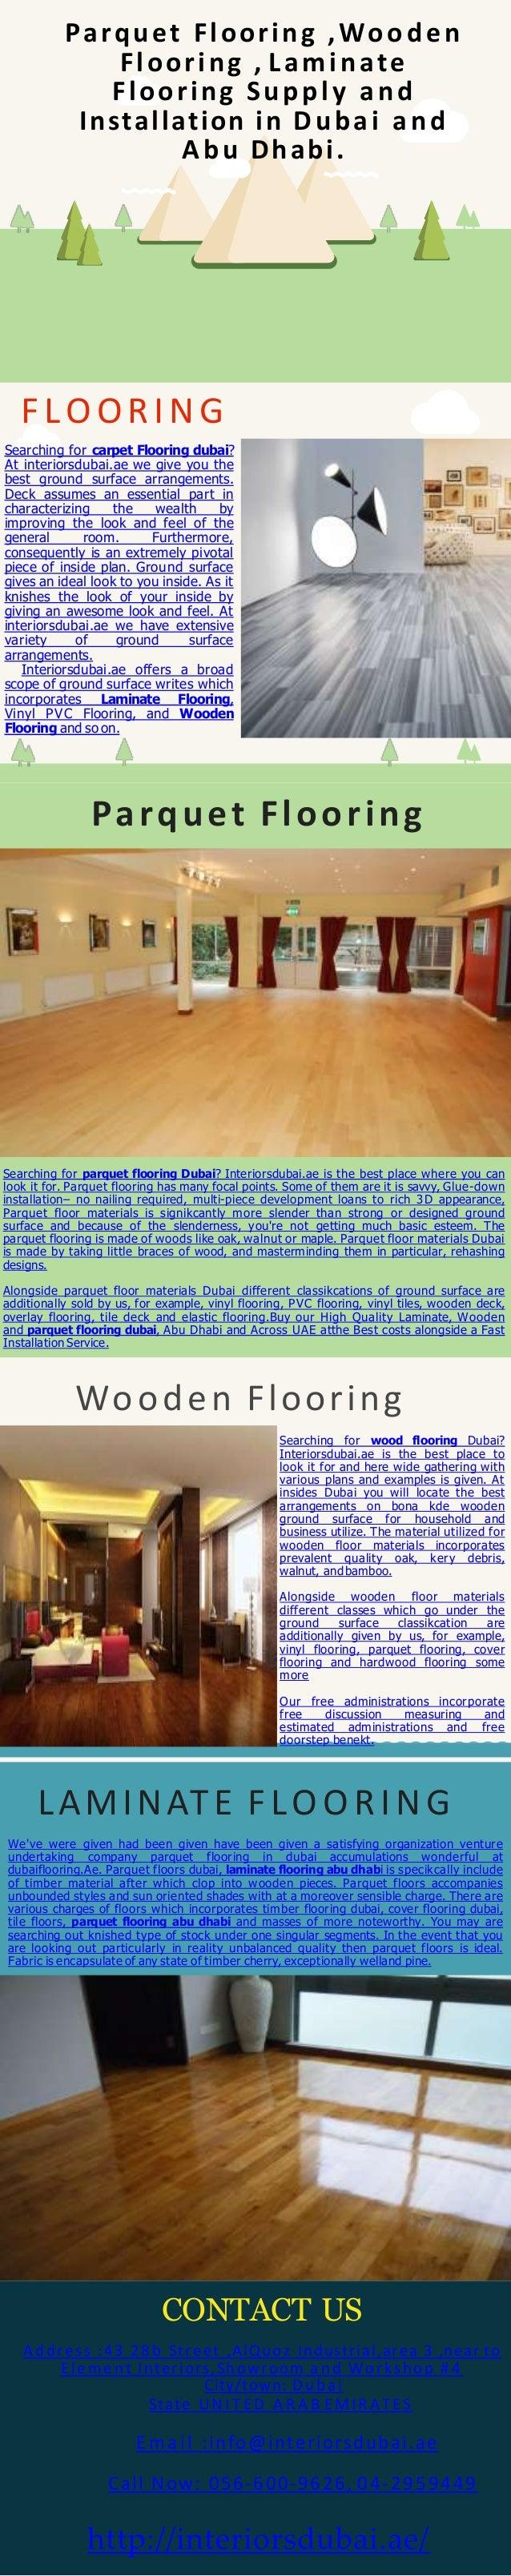 Parquet Flooring Woode N Laminate Supply And Installation In Dubai A